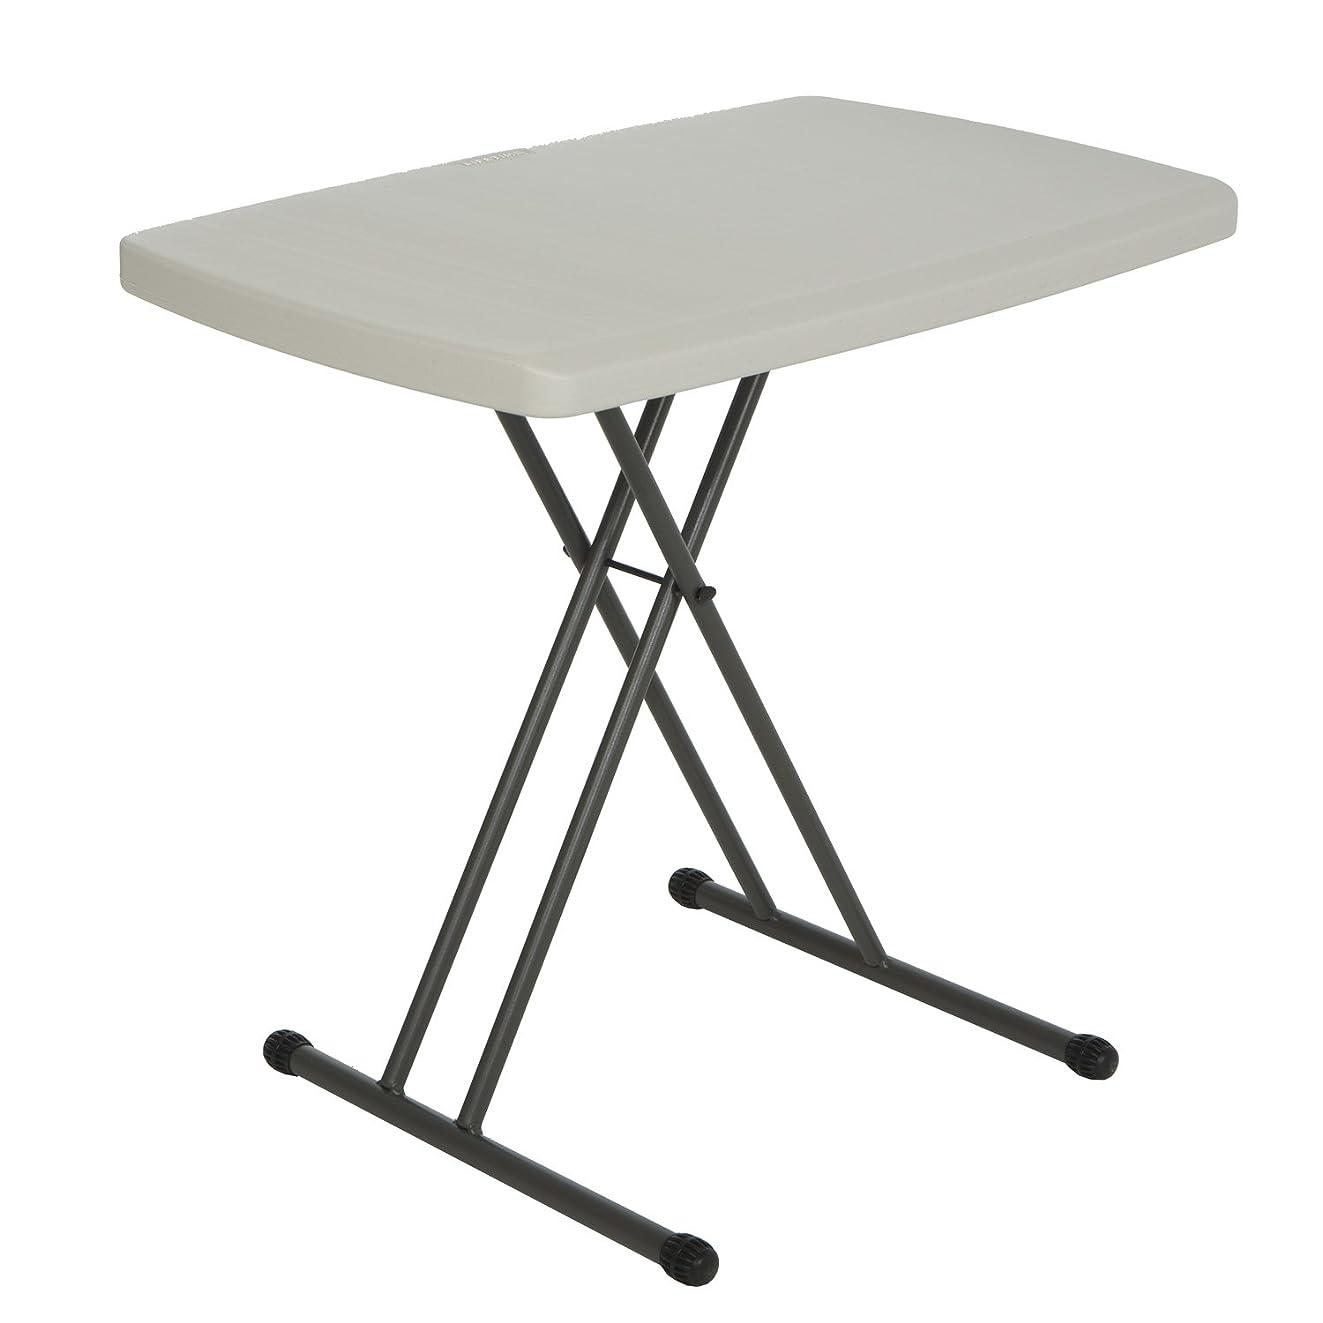 Lifetime 28240 Adjustable Folding Laptop Table TV Tray, 30 Inch, Almond